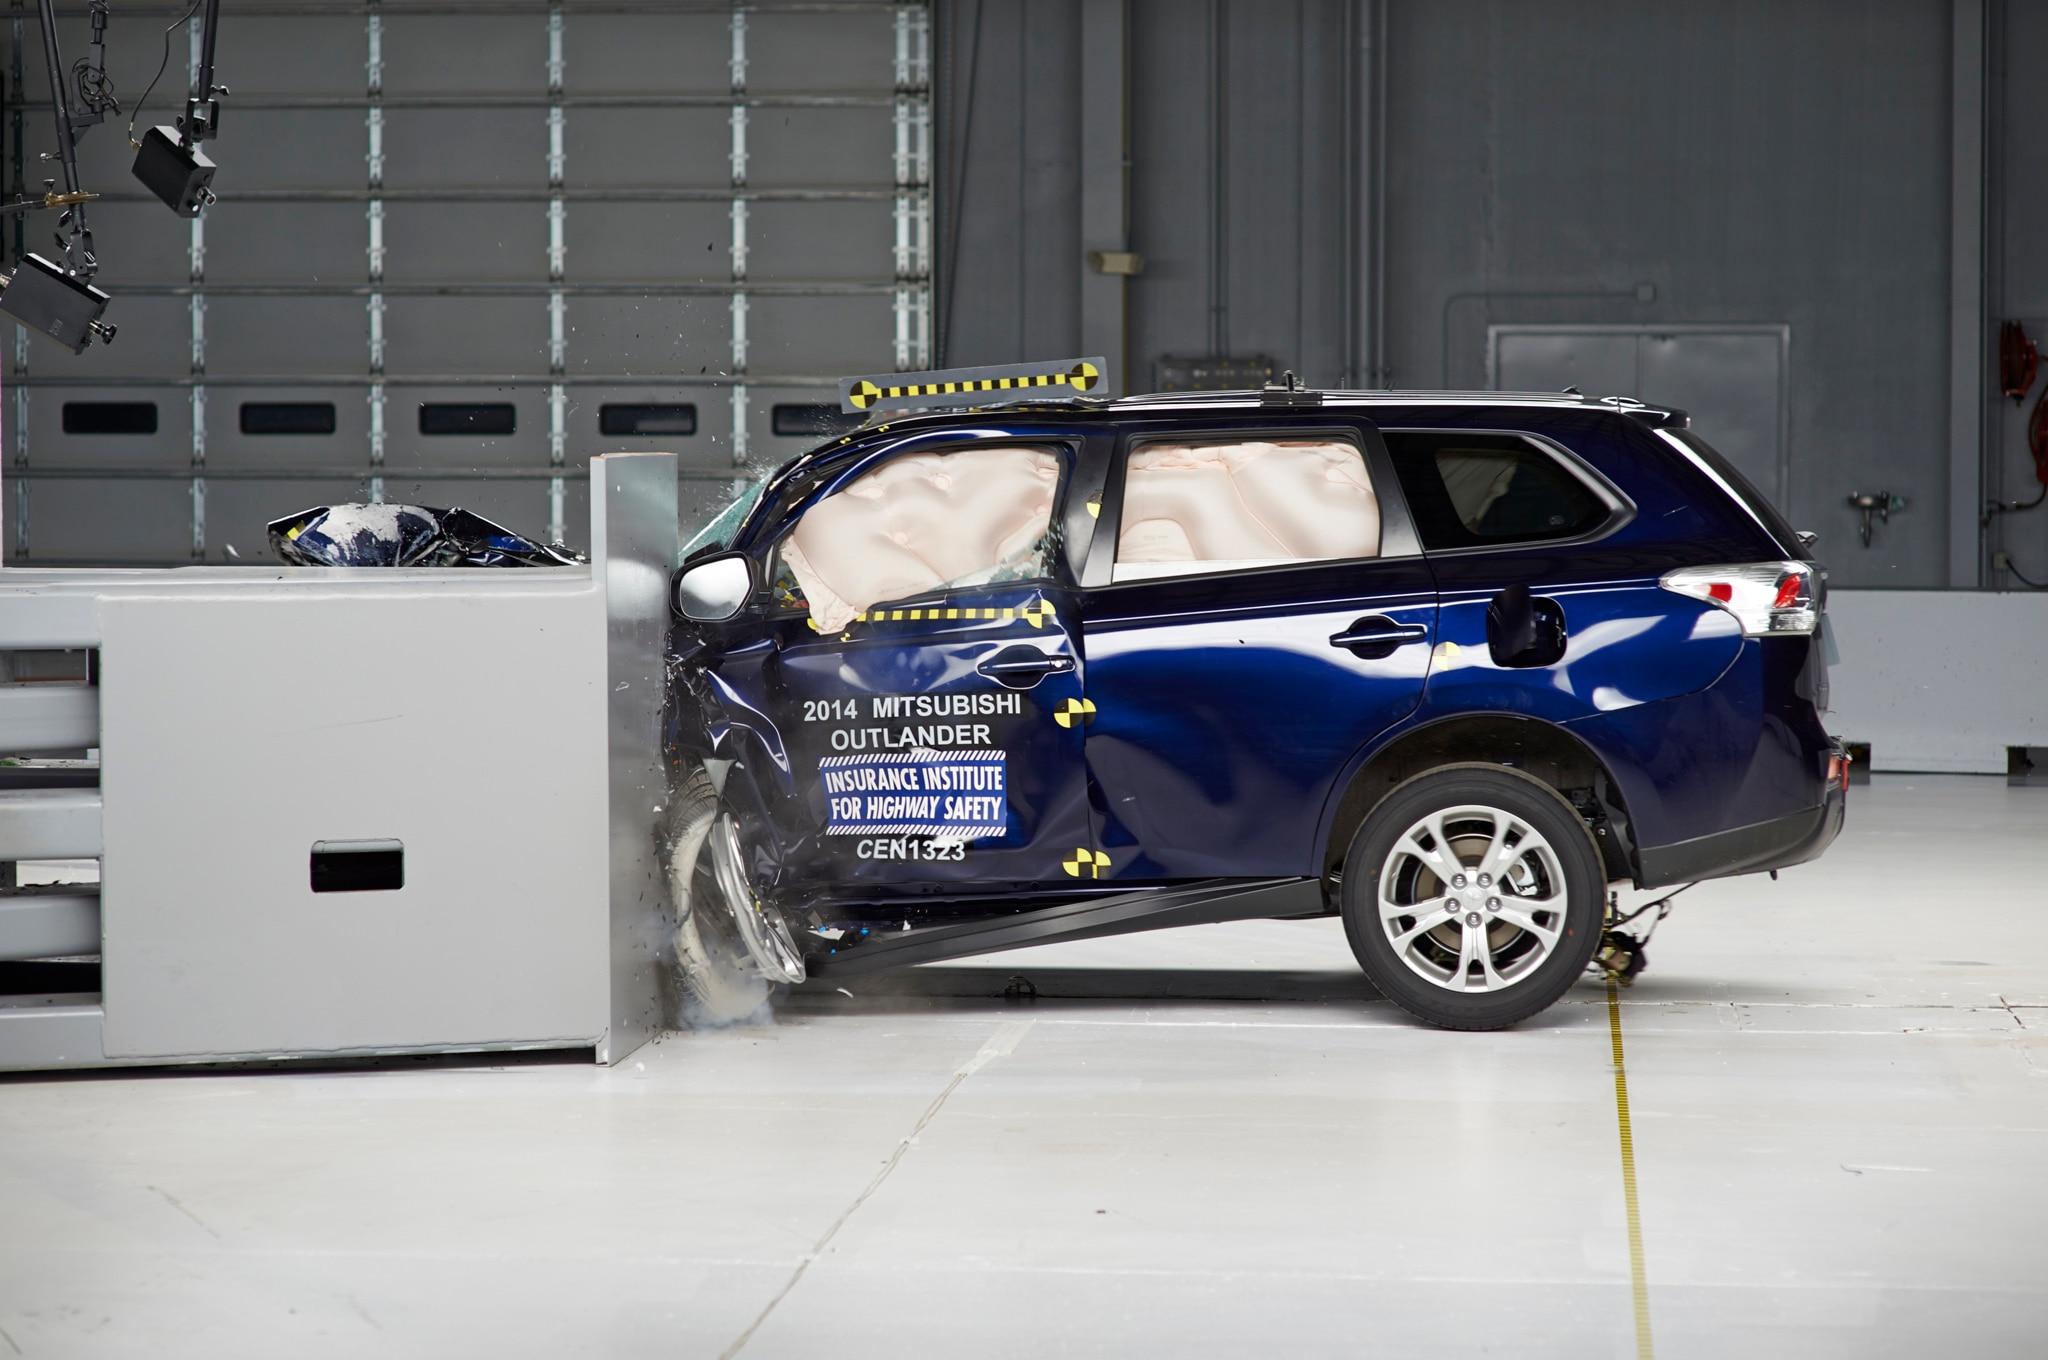 2014 Mitsubishi Outlander Crash Test1